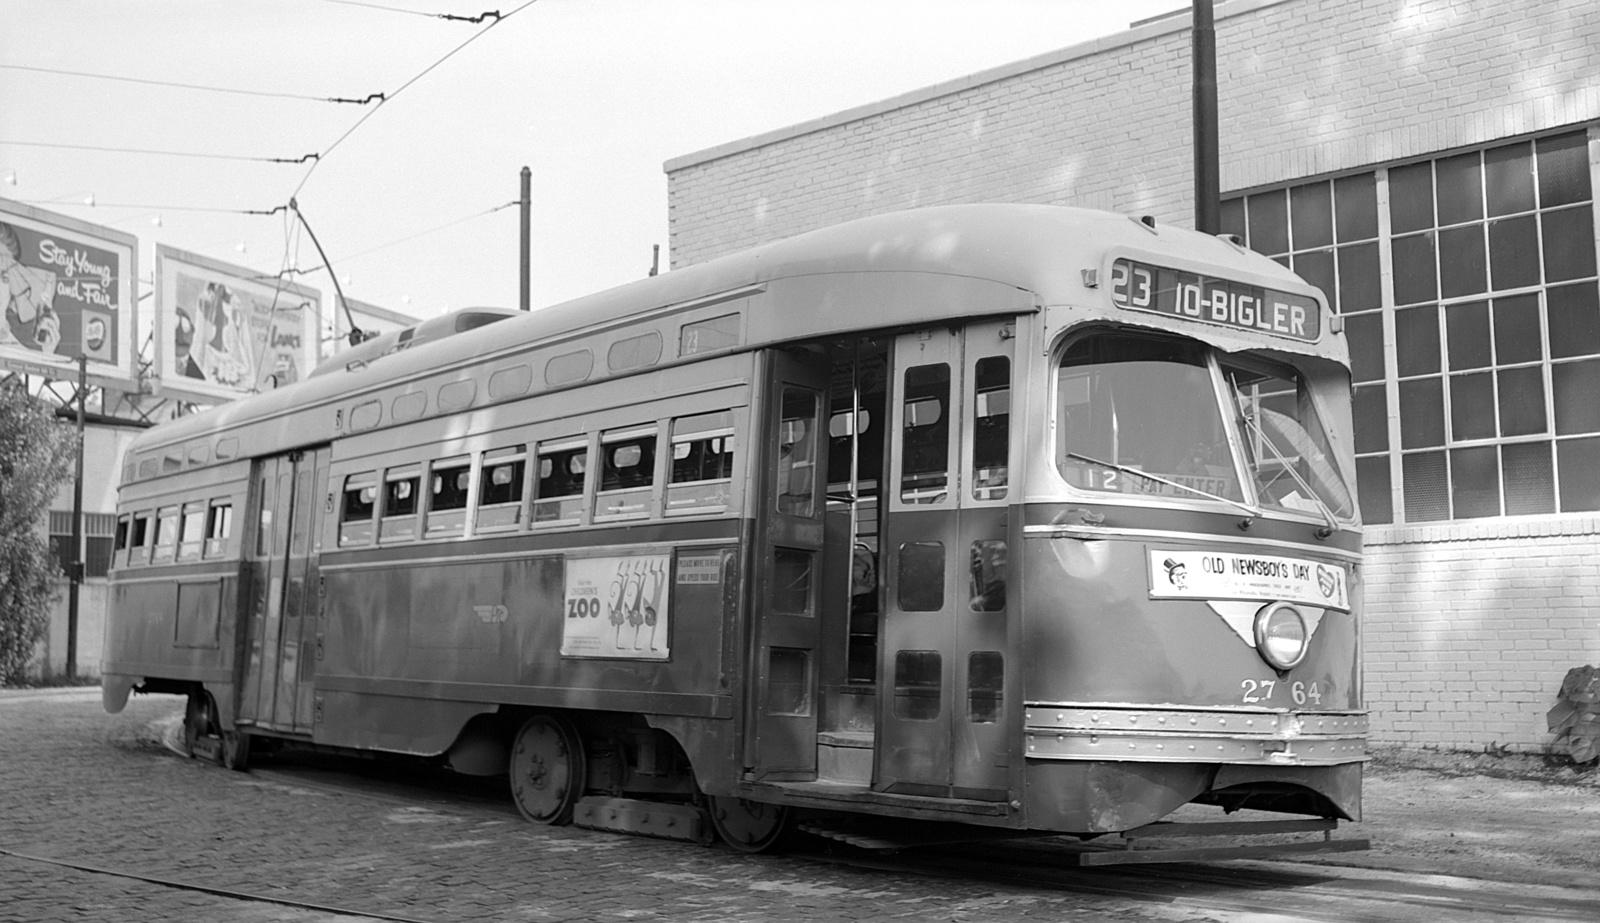 (446k, 1600x923)<br><b>Country:</b> United States<br><b>City:</b> Philadelphia, PA<br><b>System:</b> SEPTA (or Predecessor)<br><b>Line:</b> Rt. 23-Germantown<br><b>Location:</b> Bethlehem Pike/Chestnut Hill Loop<br><b>Car:</b> PTC/SEPTA Postwar All-electric PCC (St.Louis, 1947) 2764 <br><b>Collection of:</b> David Pirmann<br><b>Date:</b> 6/9/1959<br><b>Viewed (this week/total):</b> 1 / 47